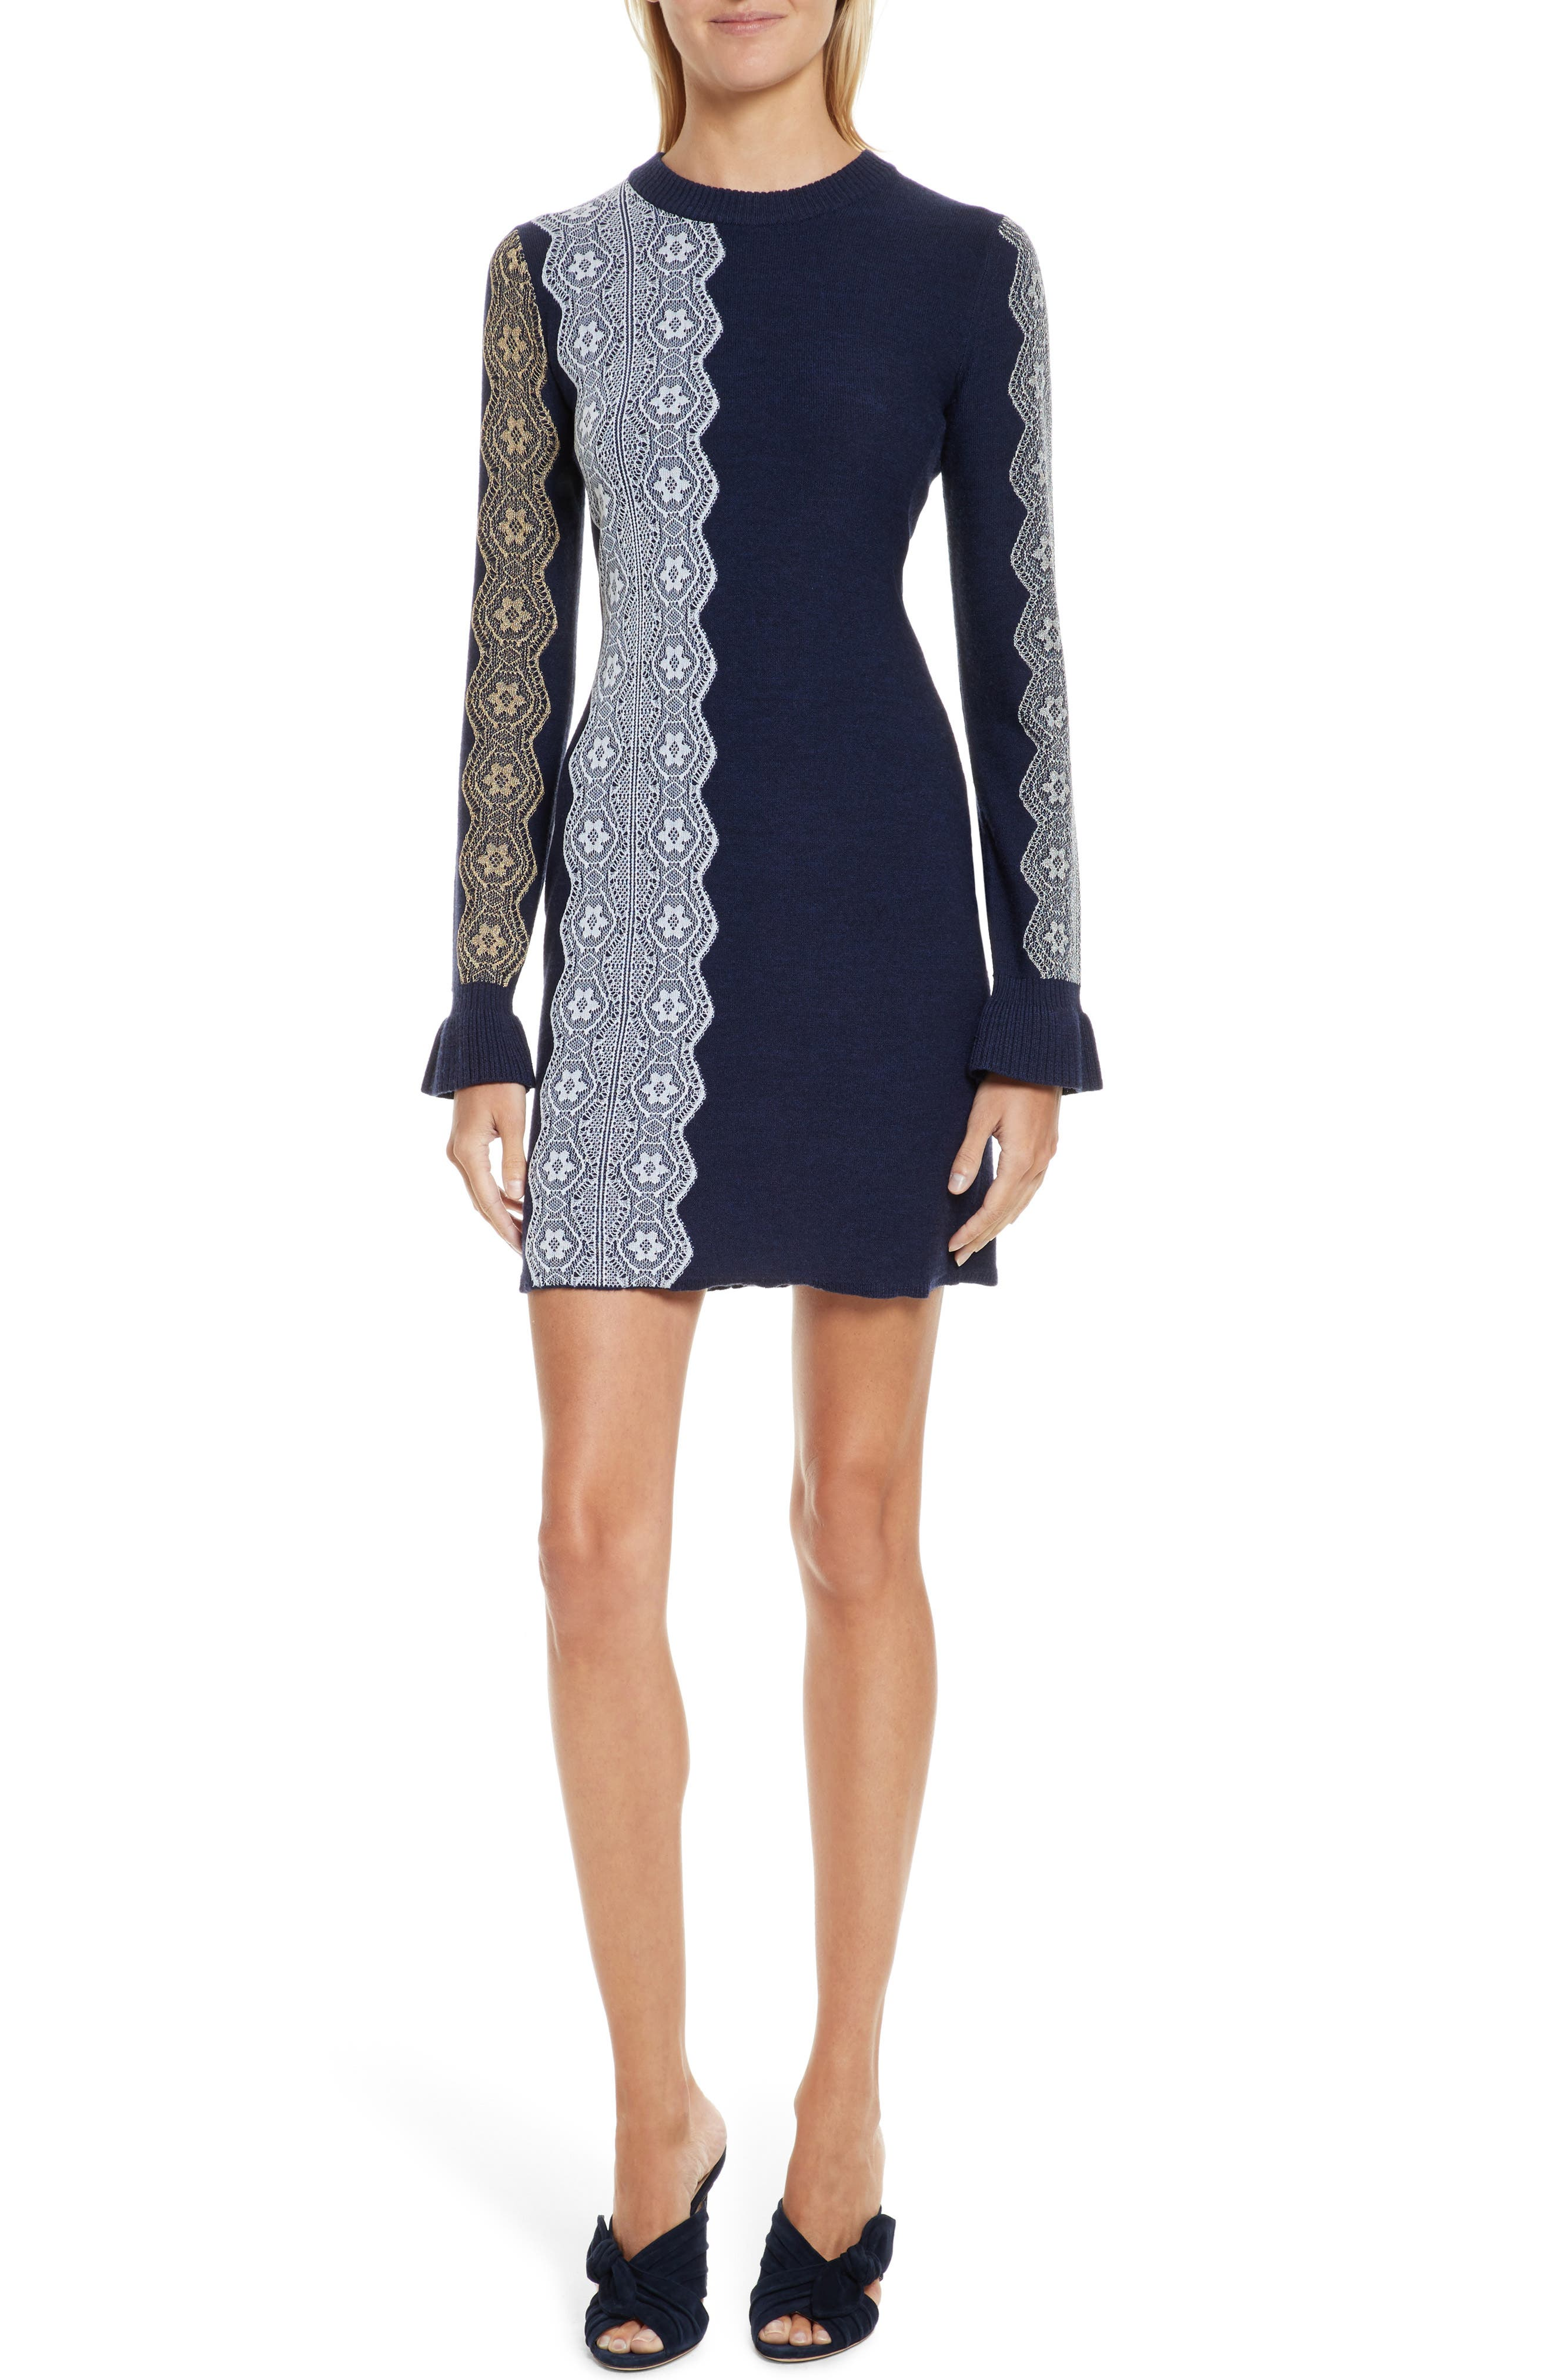 Main Image - 3.1 Phillip Lim Intarsia Lace Wool Blend Dress